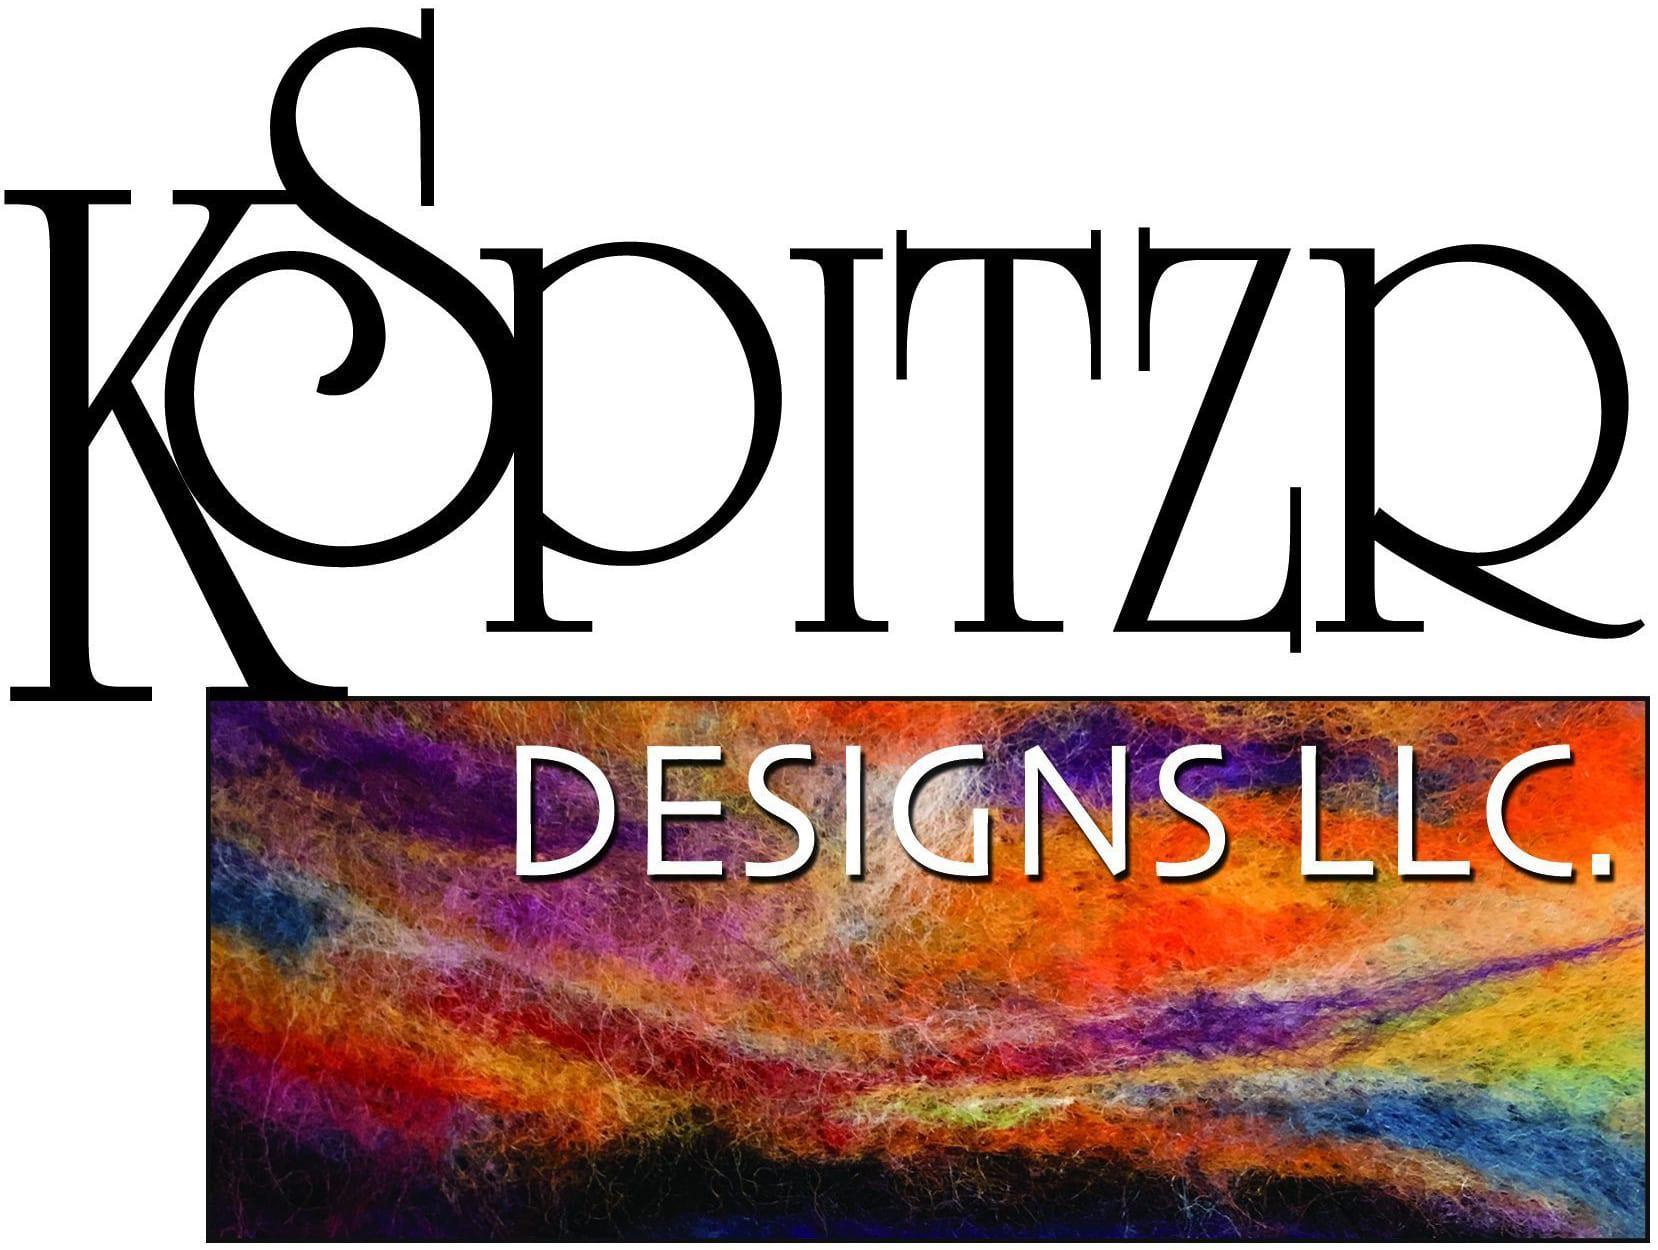 KSpitzr Designs LLC.